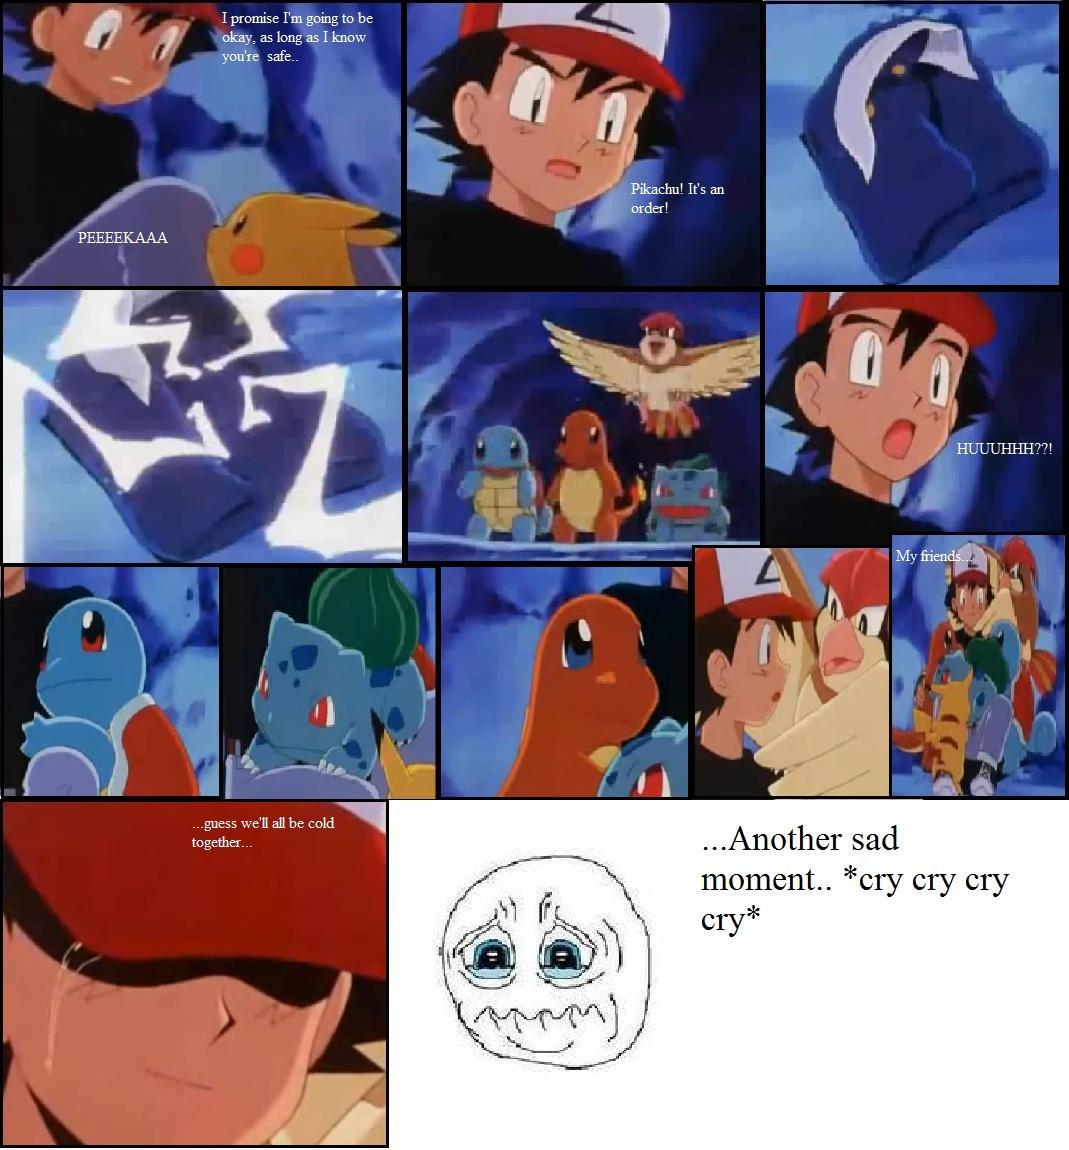 sad moment in pokemon history